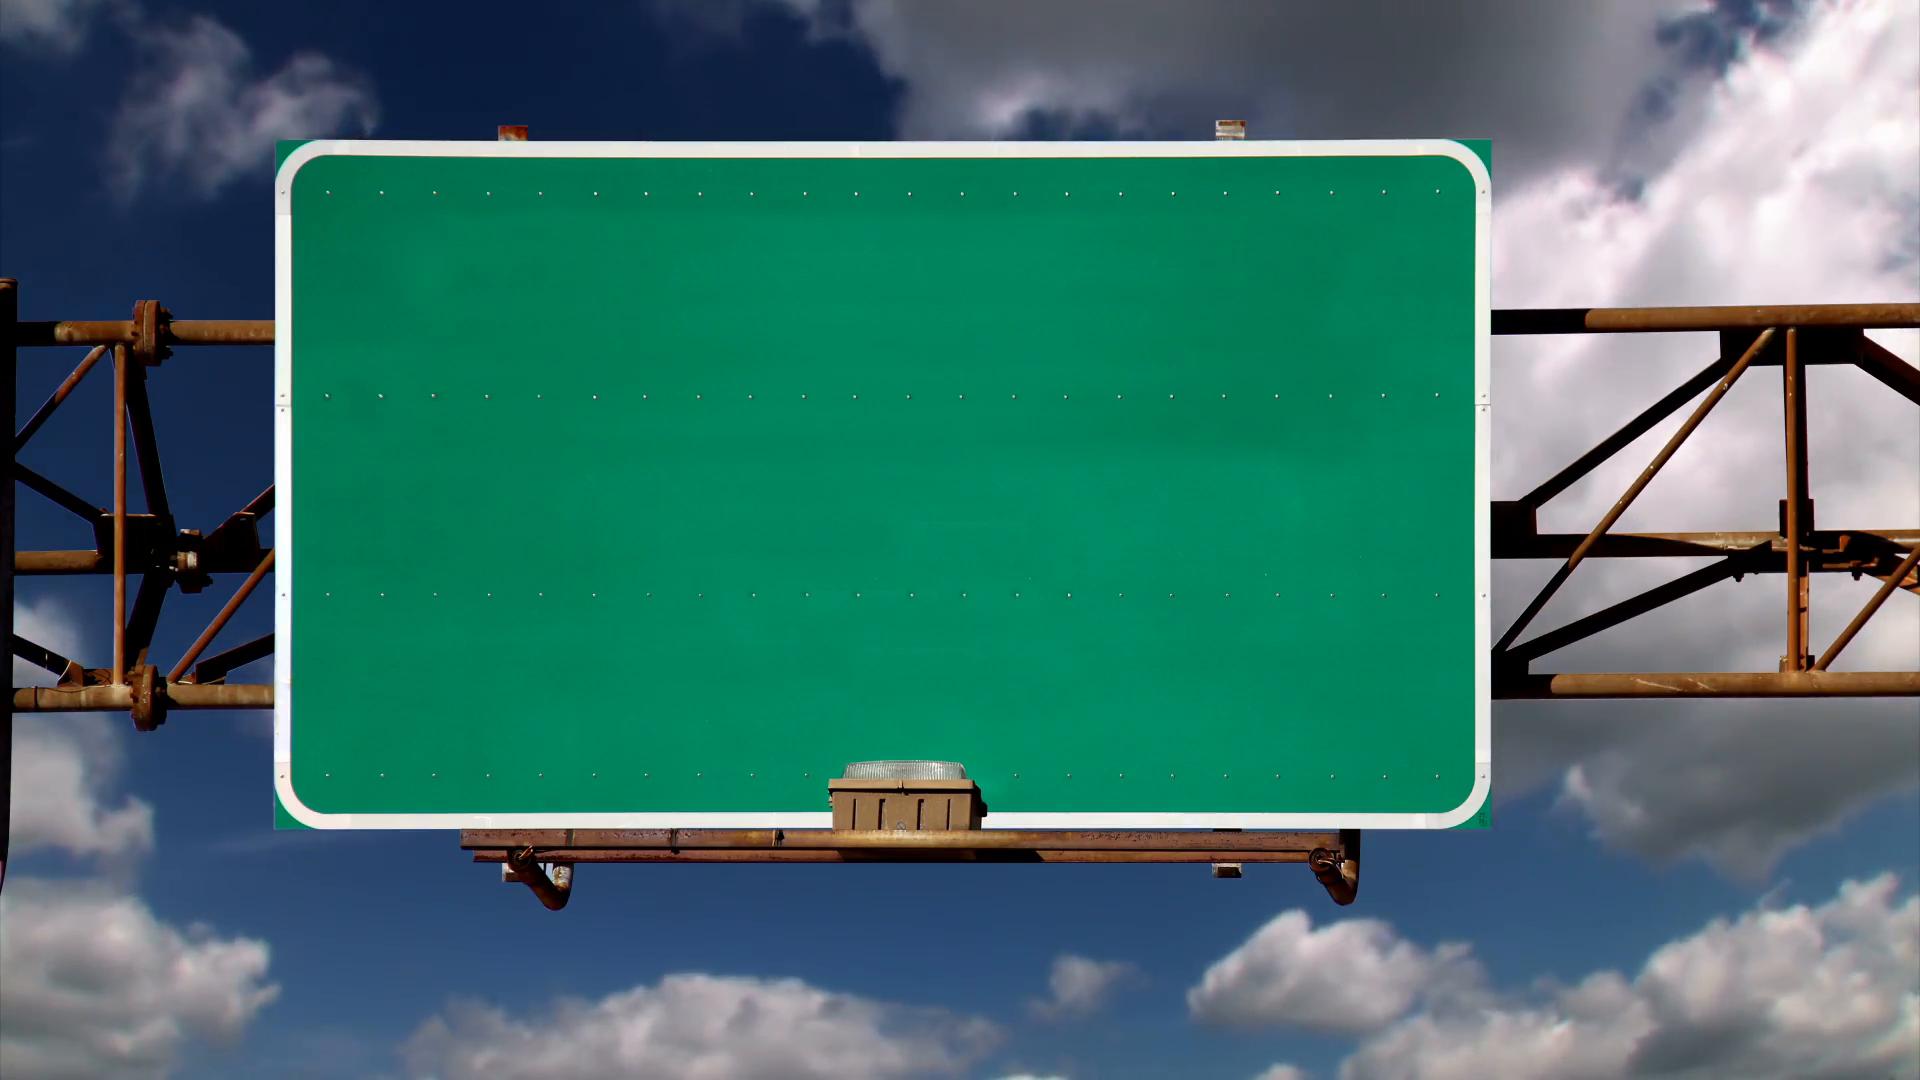 Road Sign HD PNG - 90981